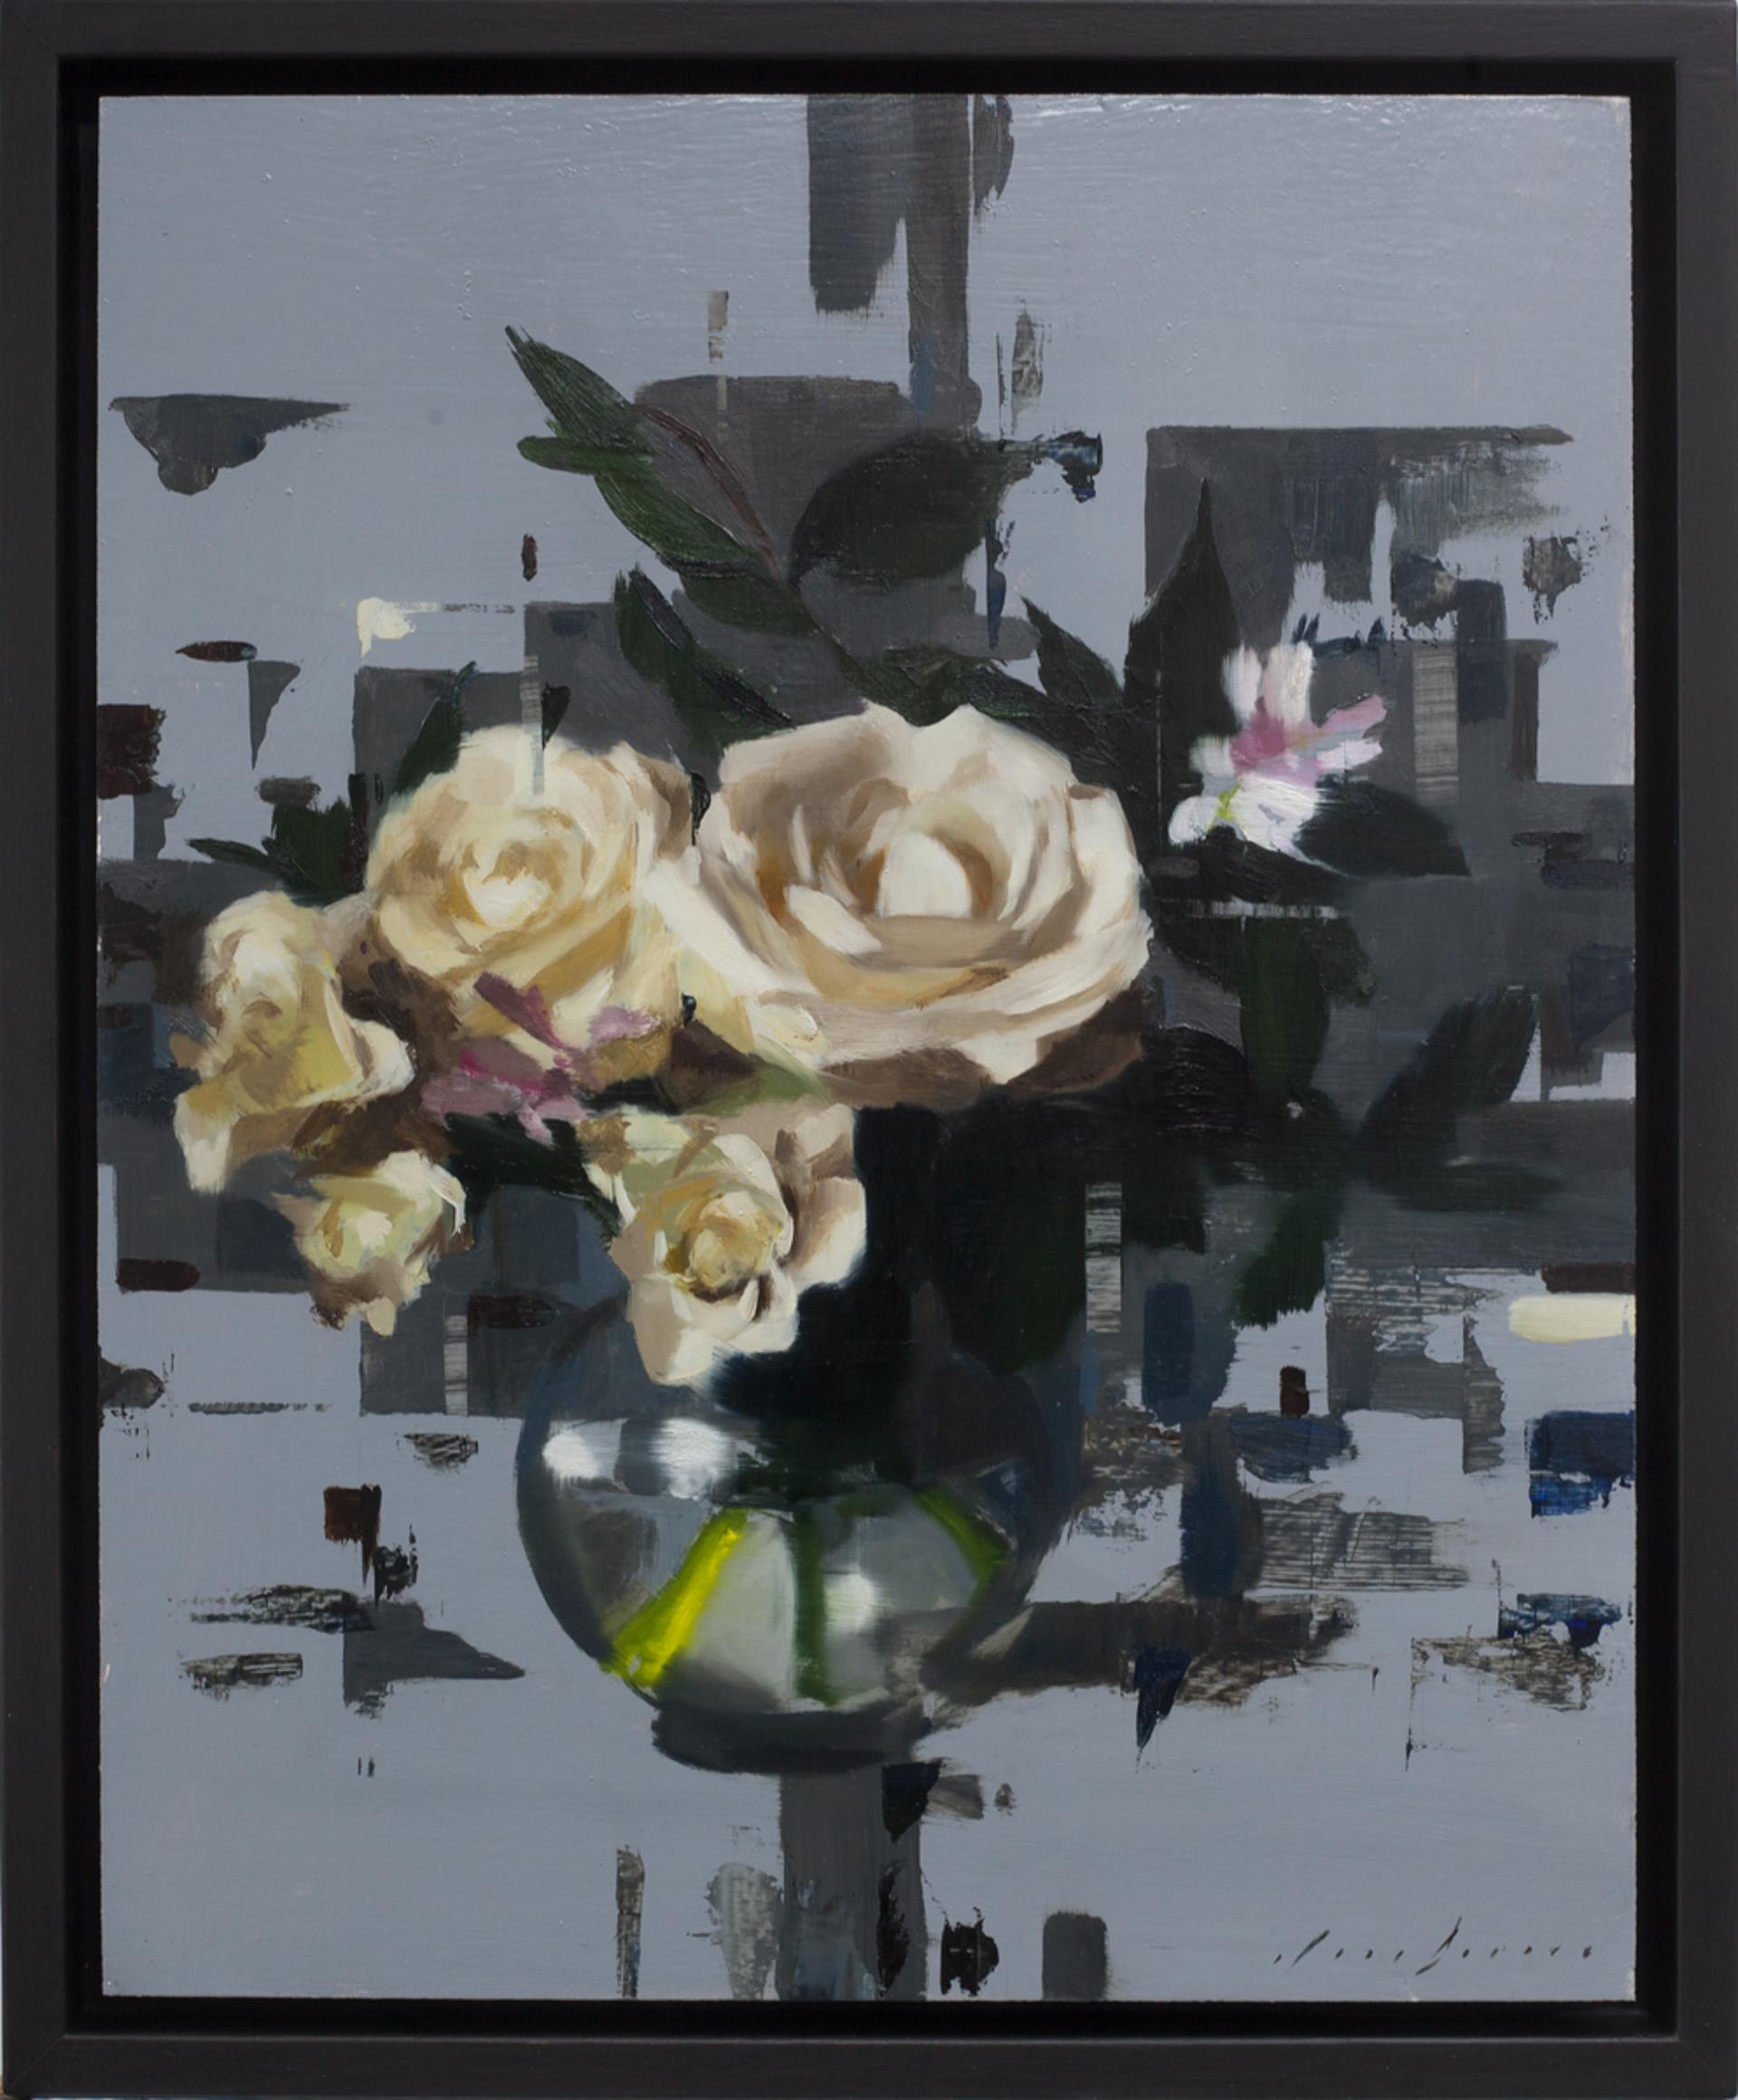 Fragmented Roses by Jon Doran